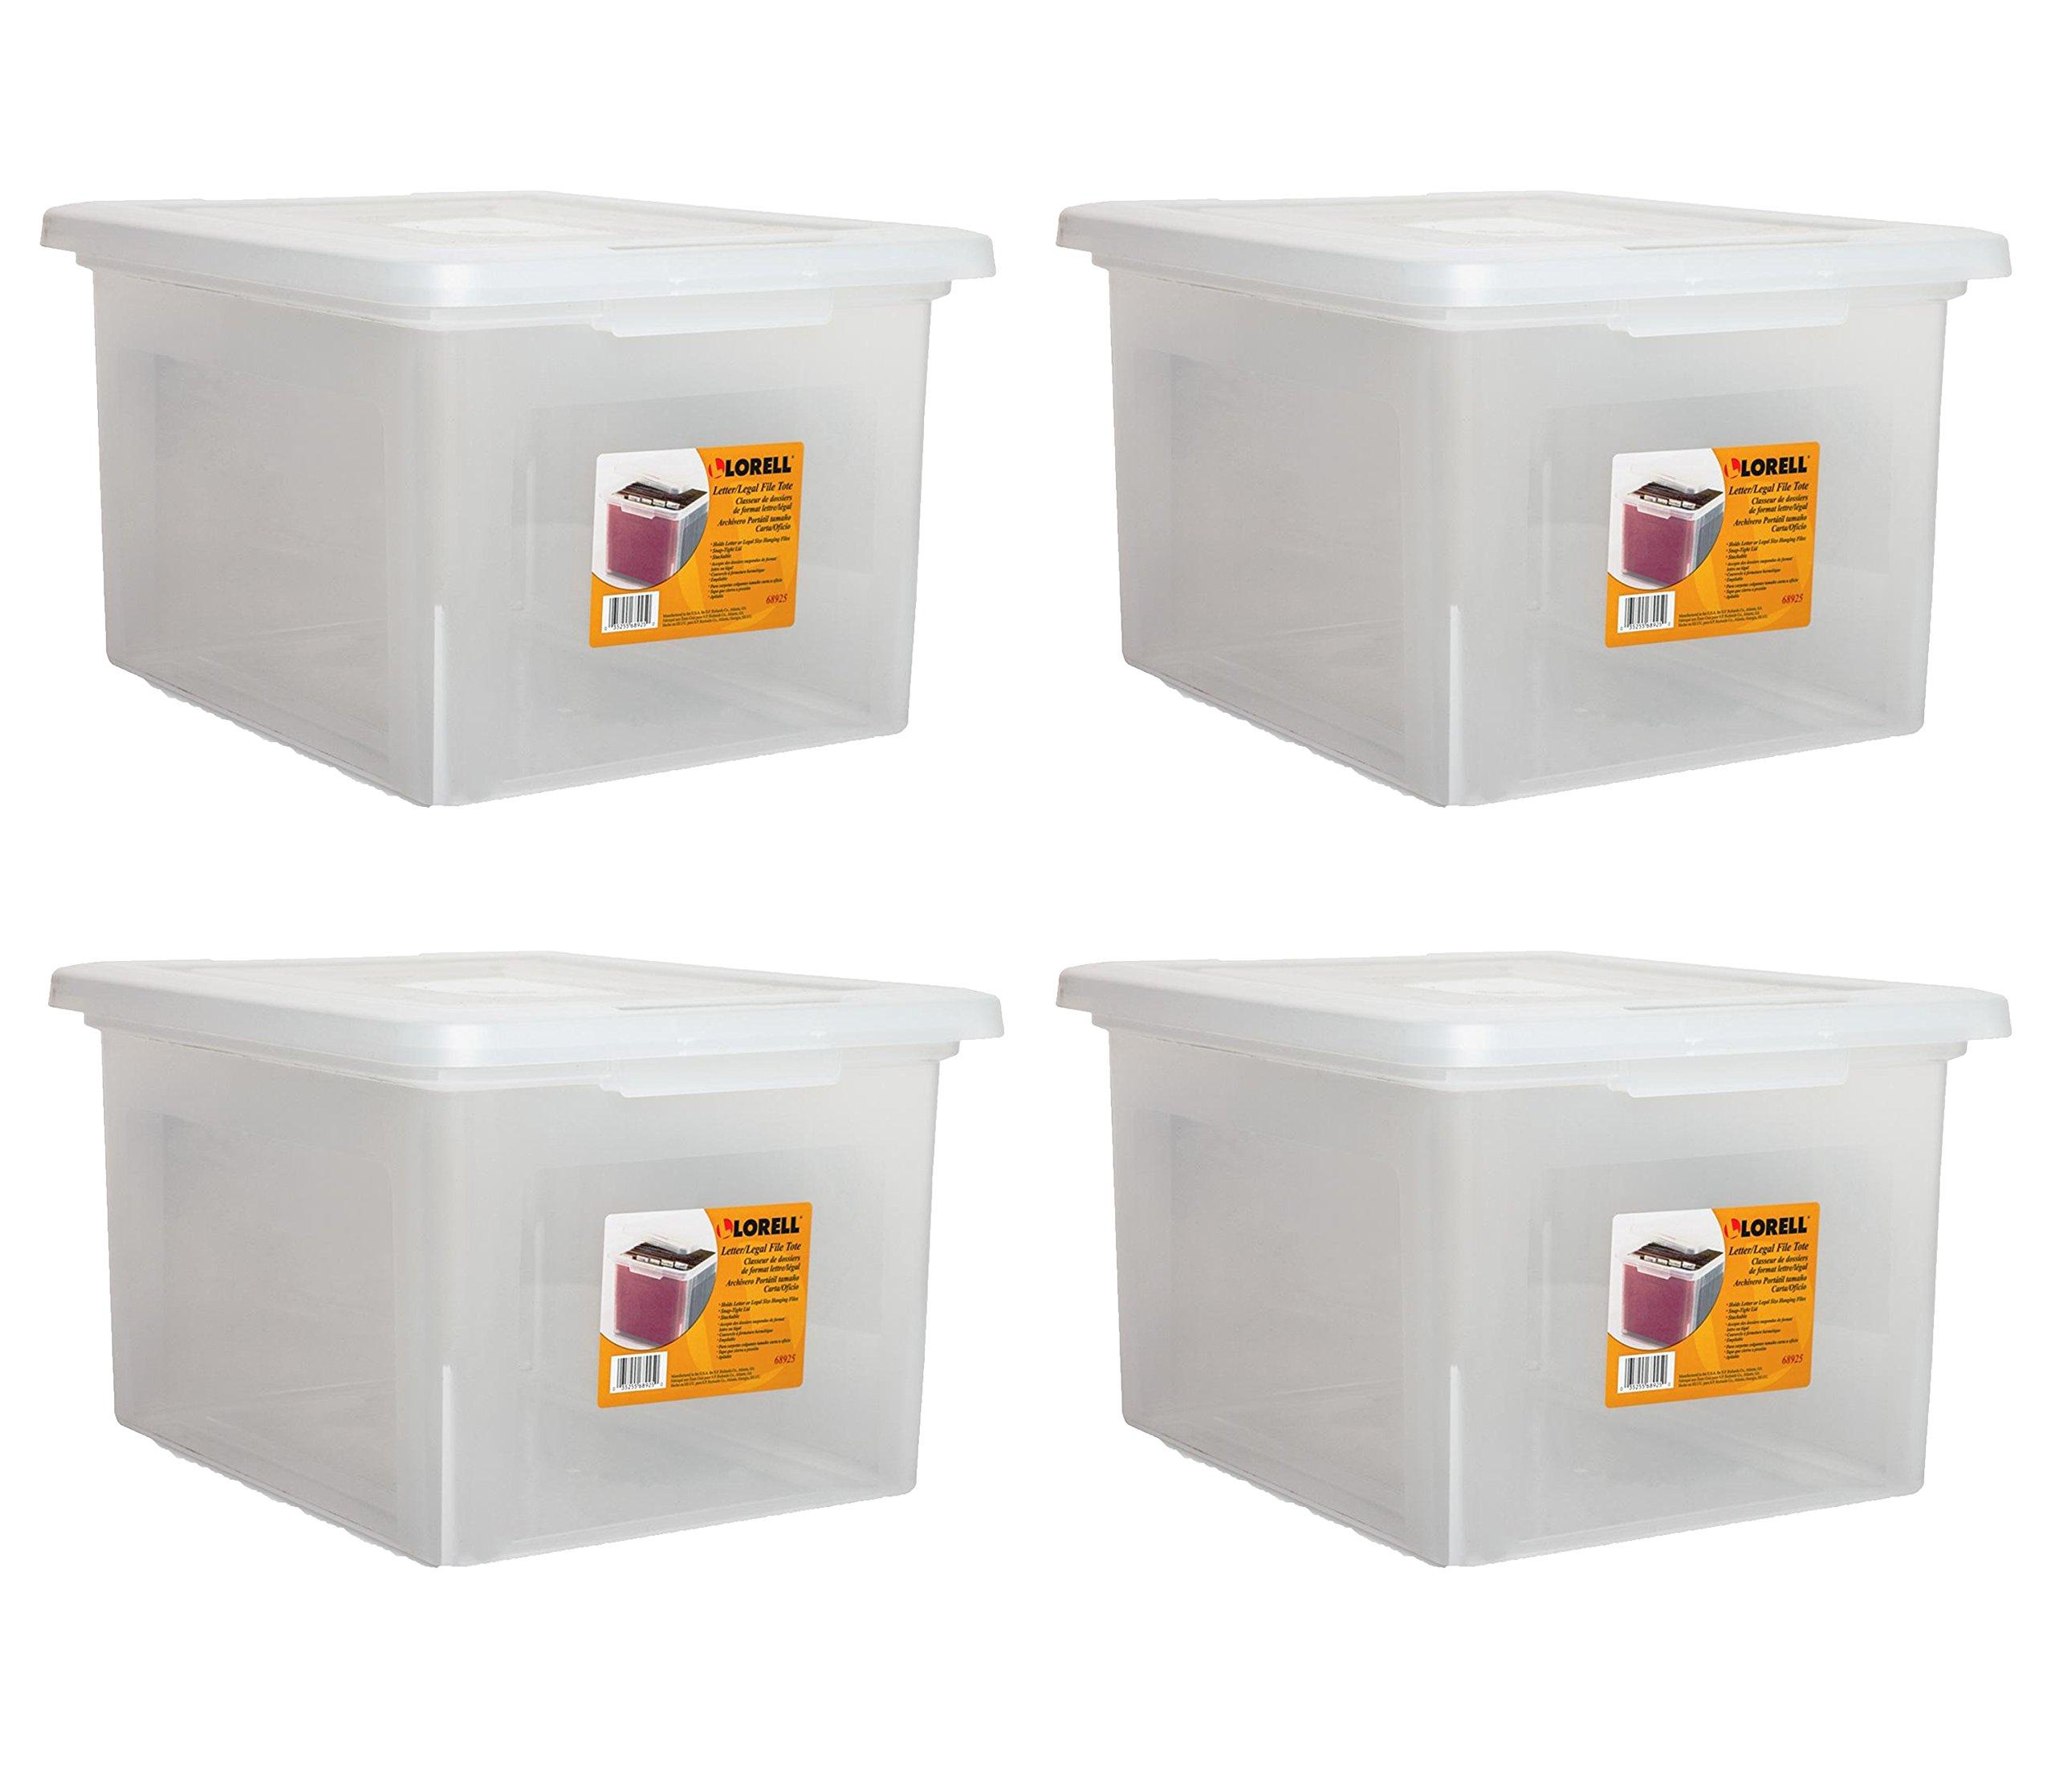 Lorell LLR68925 Letter/Legal Plastic File Box (4-Pack Savings)